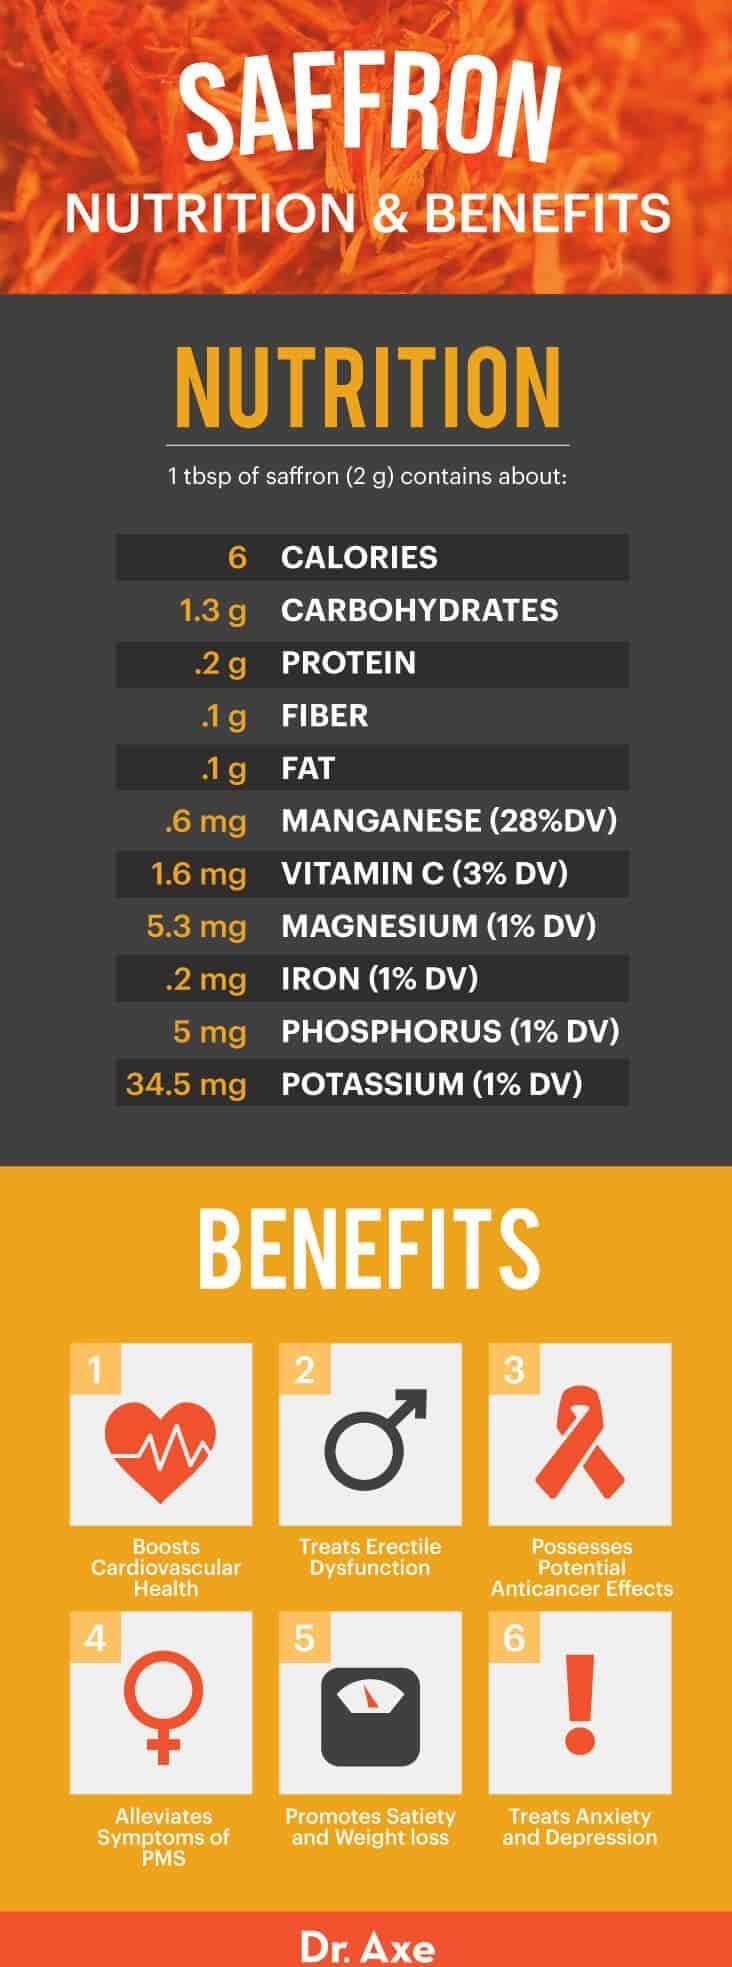 Saffron nutrition and benefits - Dr. Axe